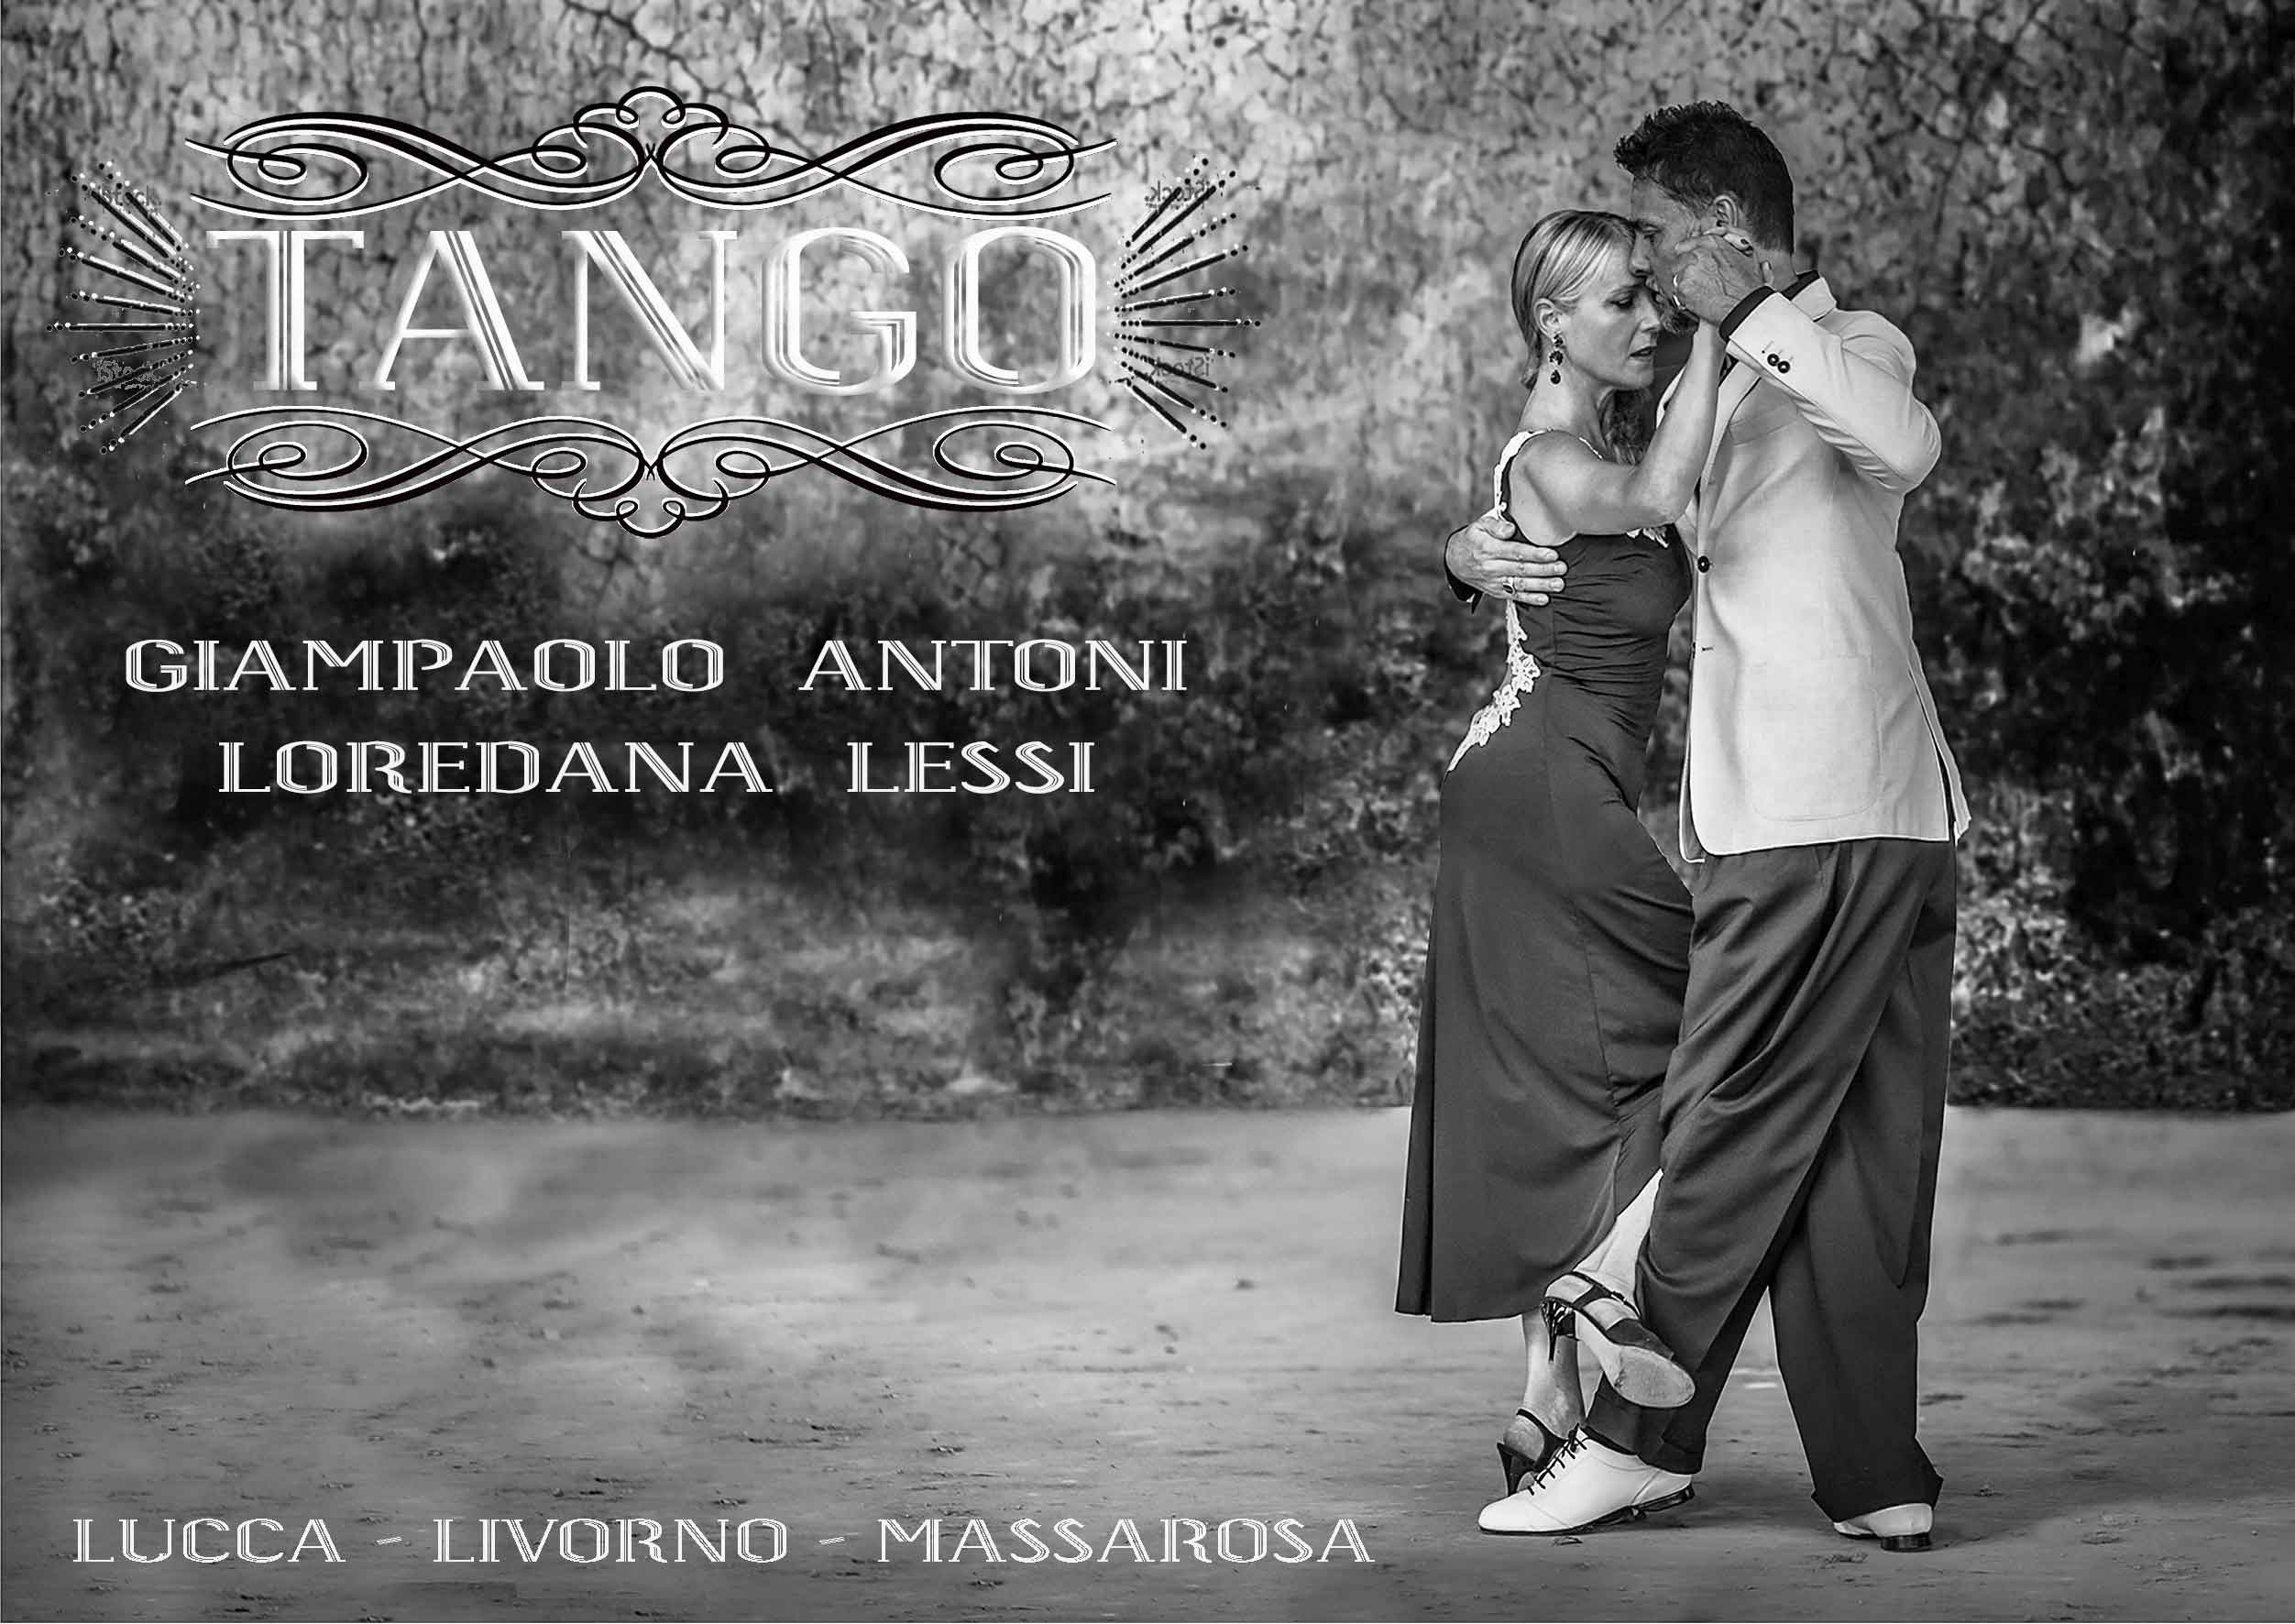 Tango Lezioni